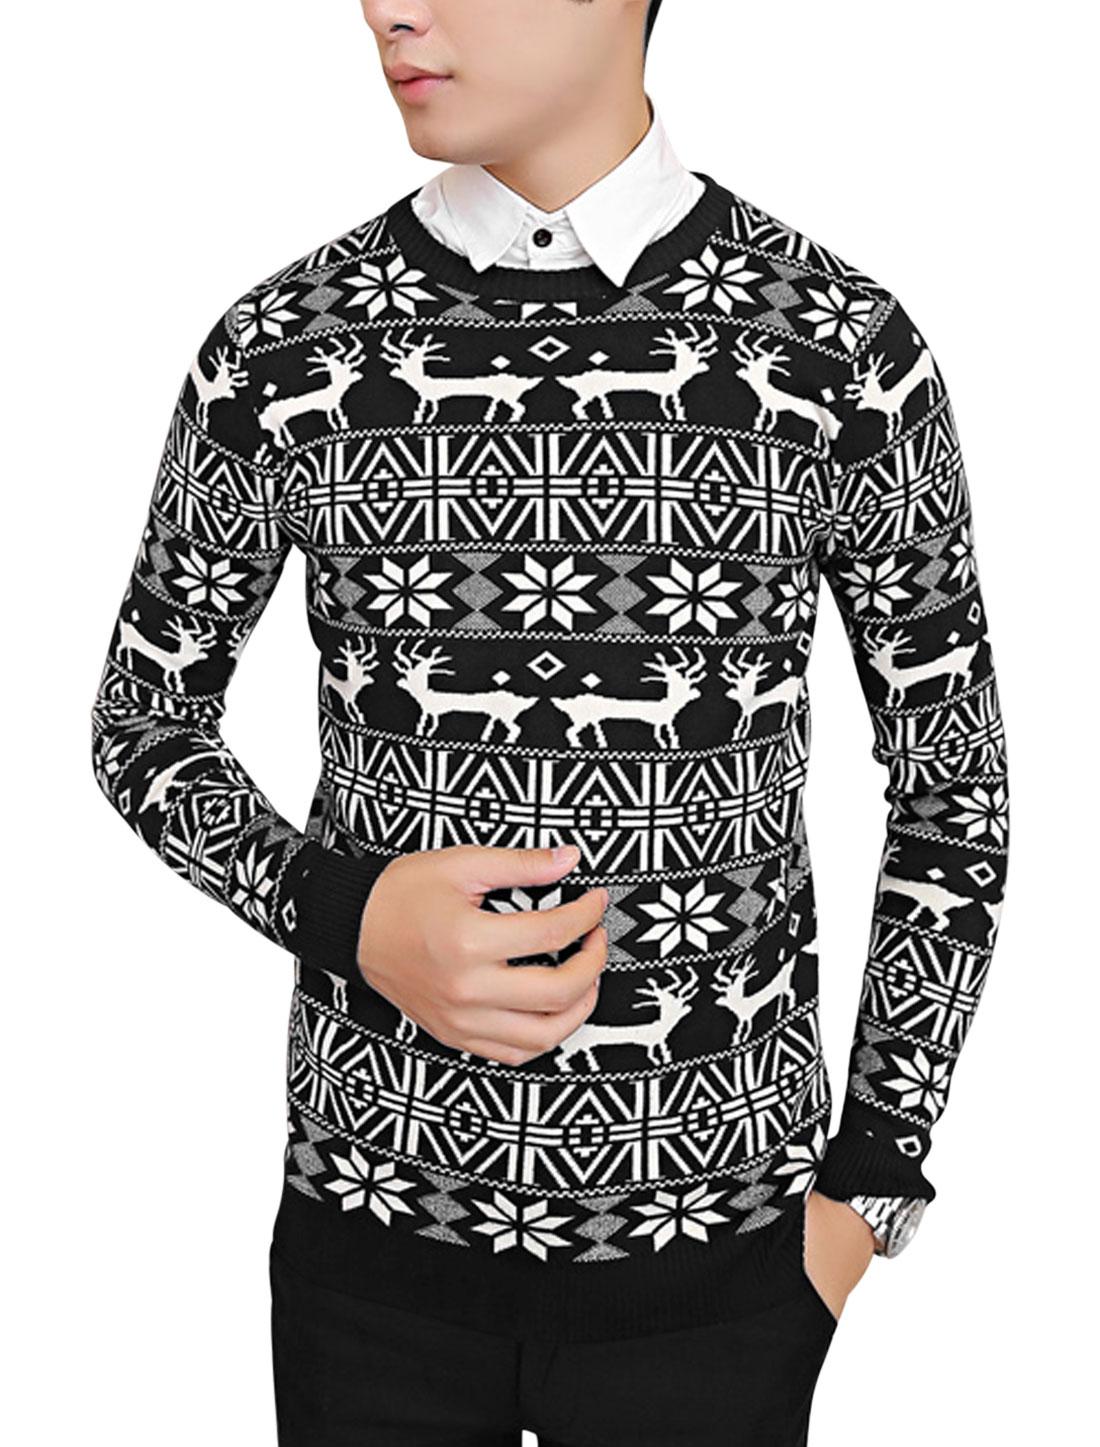 Men Pullover Geometric Deer Pattern Casual Knit Shirt Black M